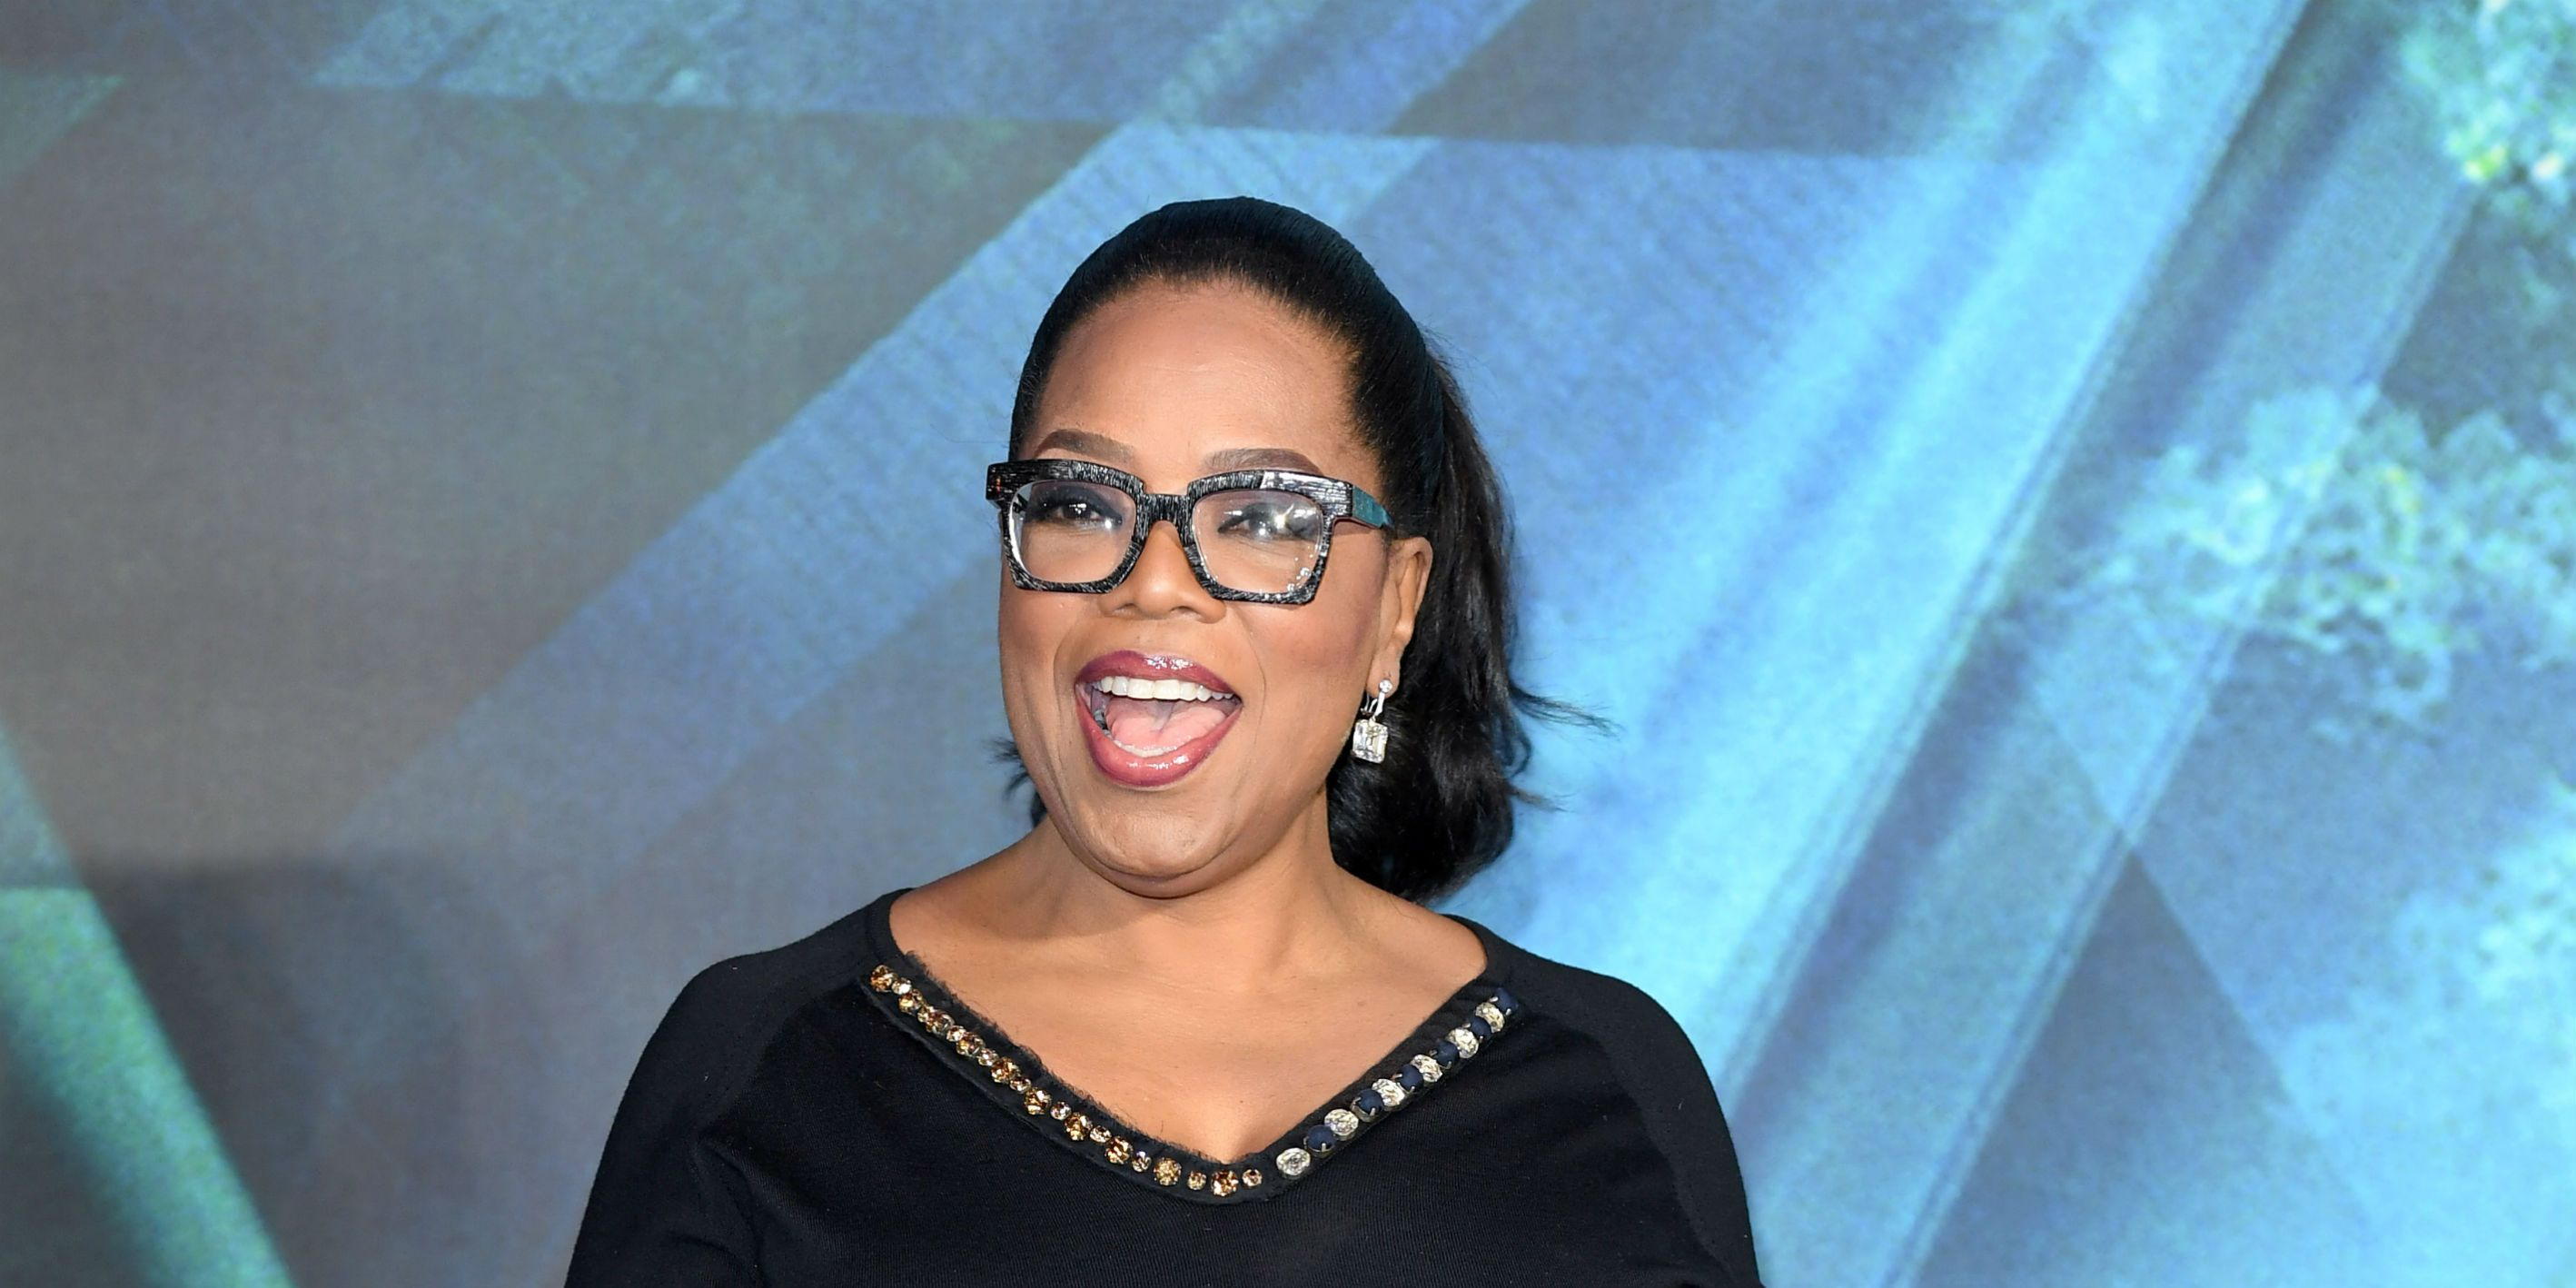 Oprah Winfrey attends the European Premiere of 'A Wrinkle In Time'